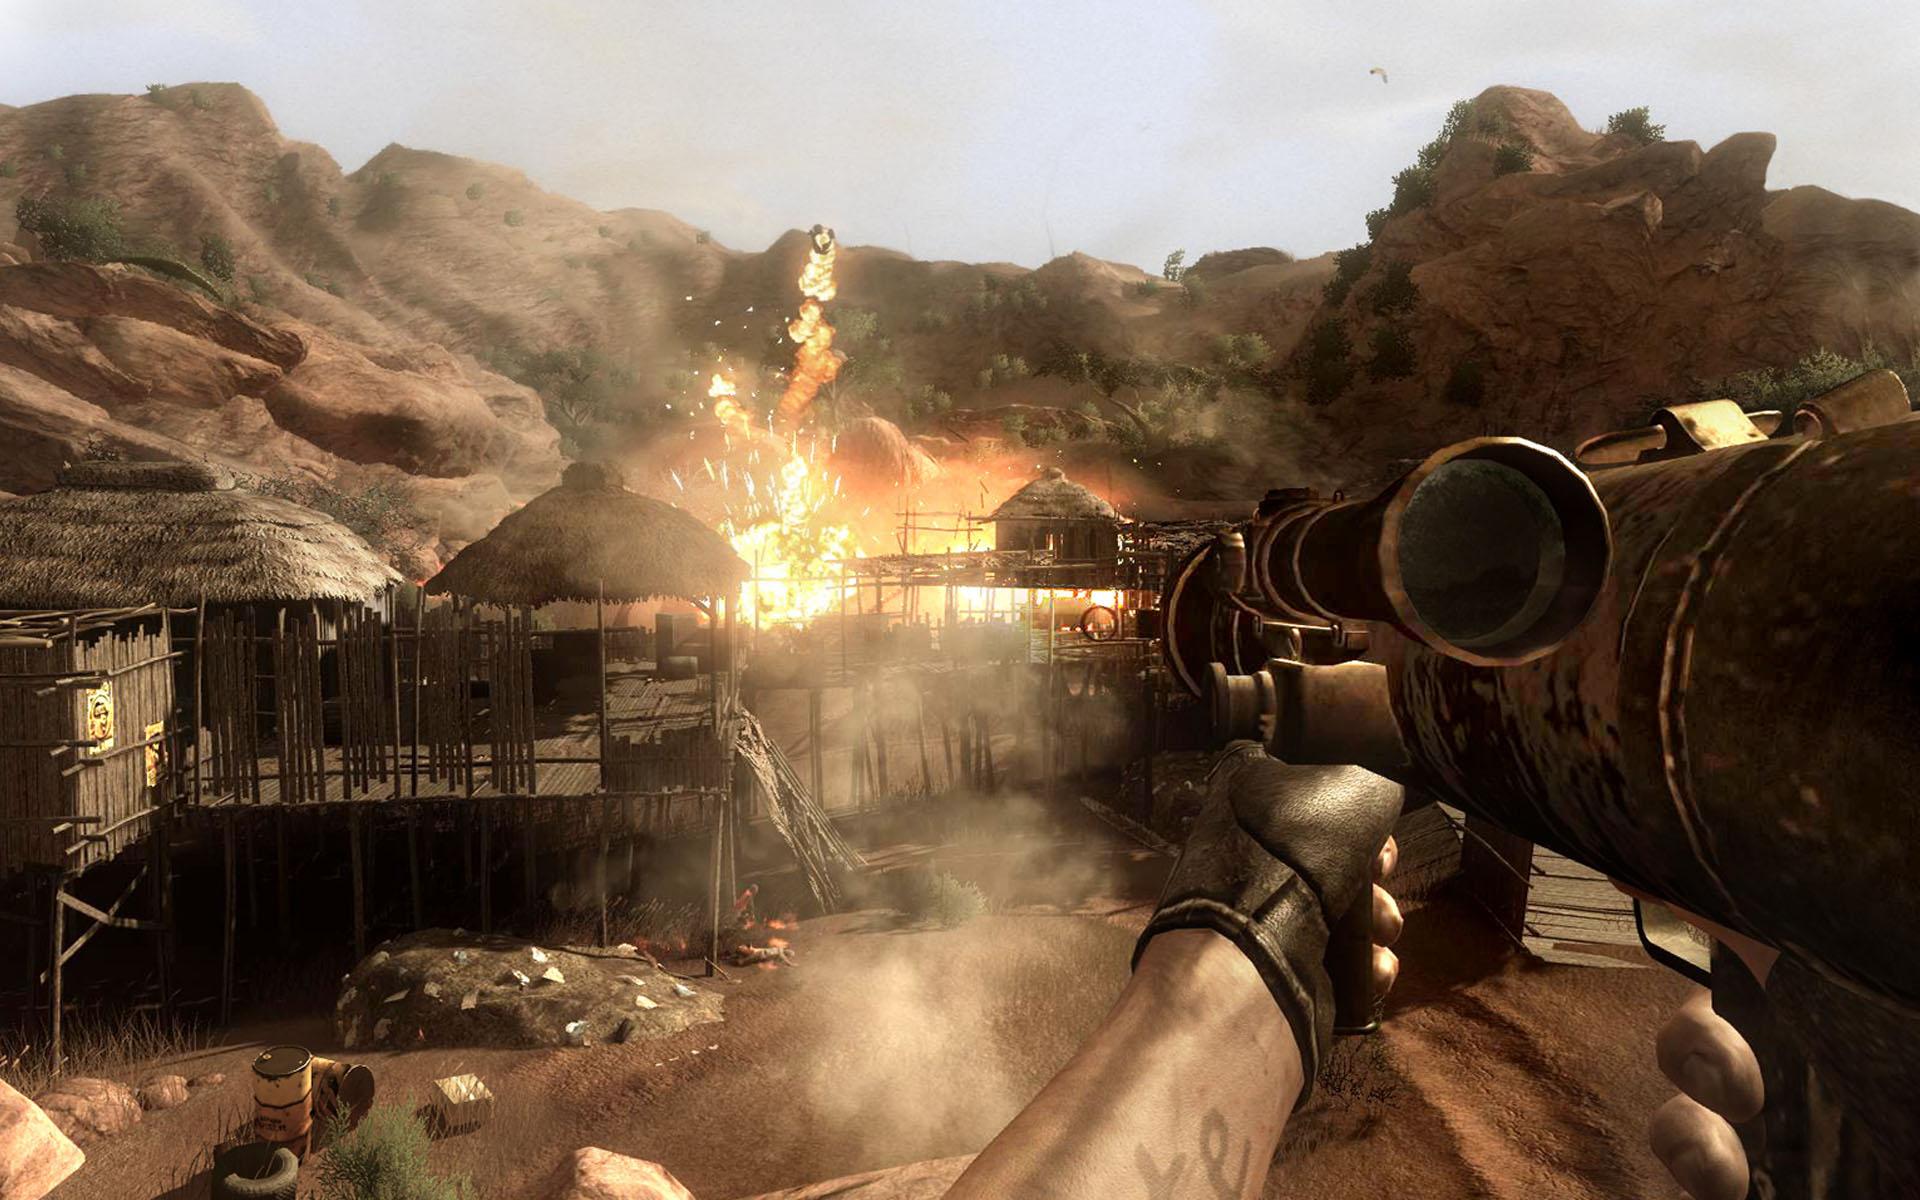 Se armó: Far Cry 3 confirmado por Ubisoft [Secuela de Secuelas]